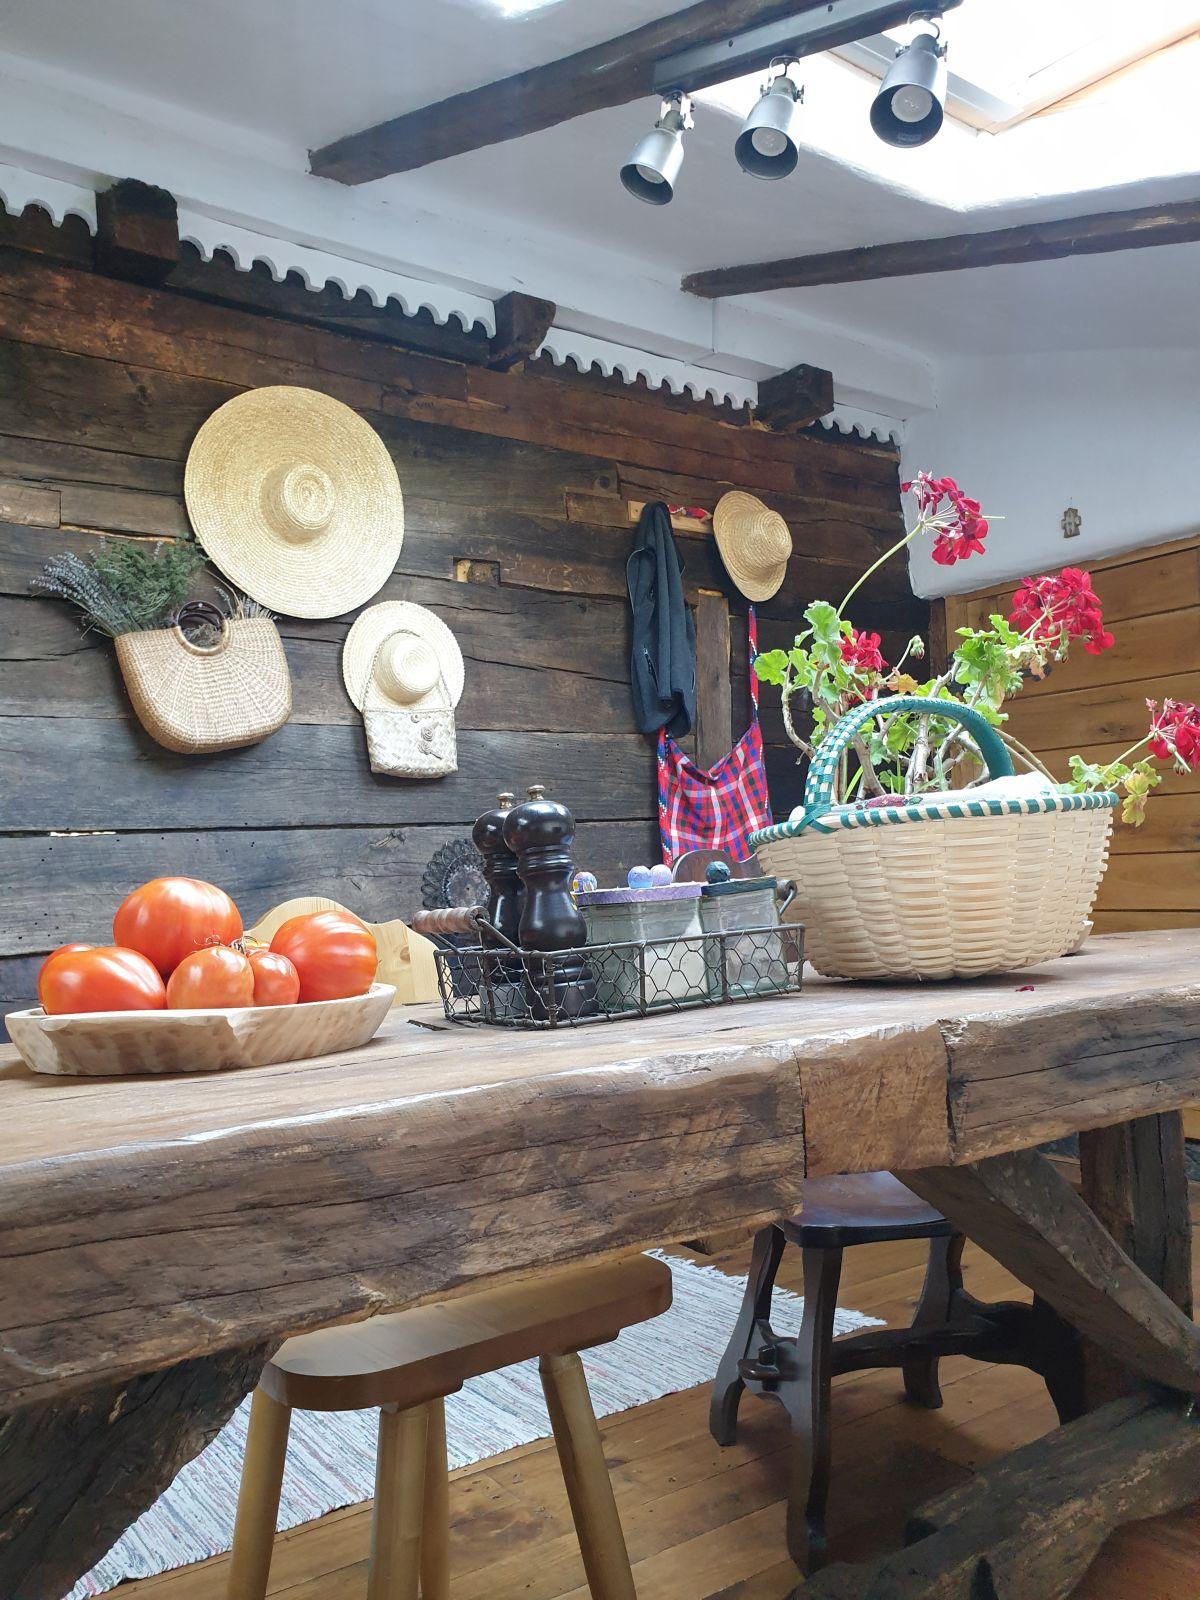 adelaparvu.com despre magazie de lemne transformata in bucatarie, casa de lemn Romania, Foto Adela Parvu (5)